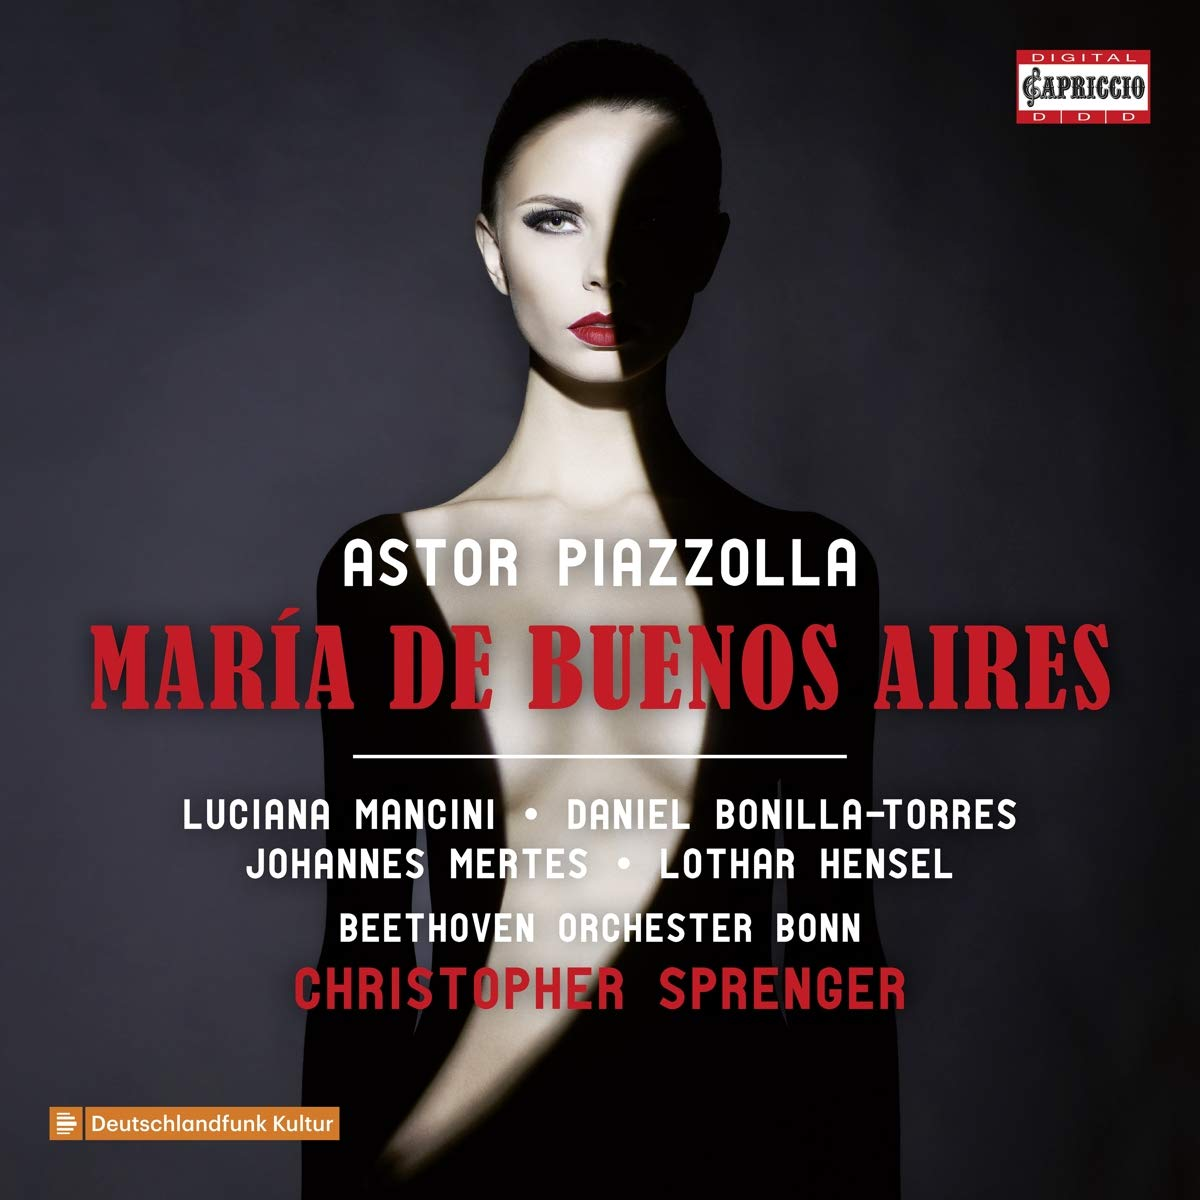 CD : DANIEL BONILLA TORRES - LUCIANA MANCINI - JOHANNES MERTES - LOTHAT HENSER - Maria De Buenos Aires (2 Pack)